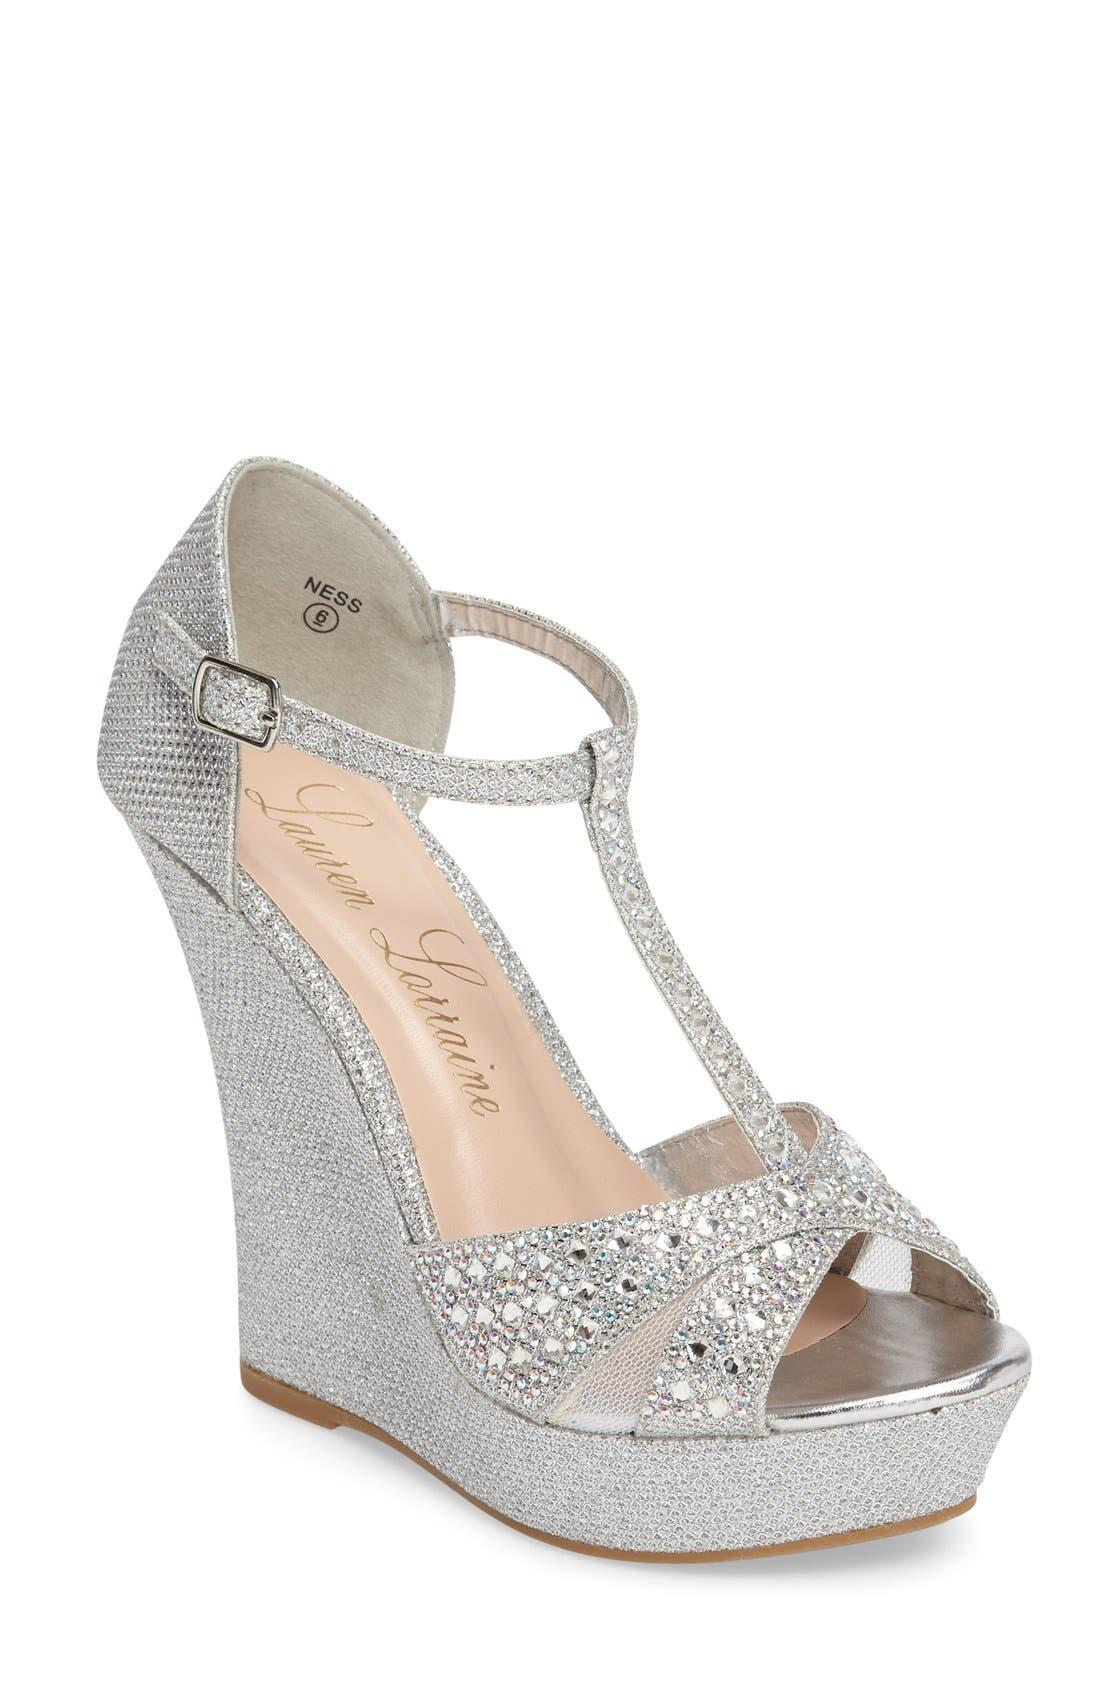 Ness Crystal Embellished Wedge Sandal,                             Main thumbnail 2, color,